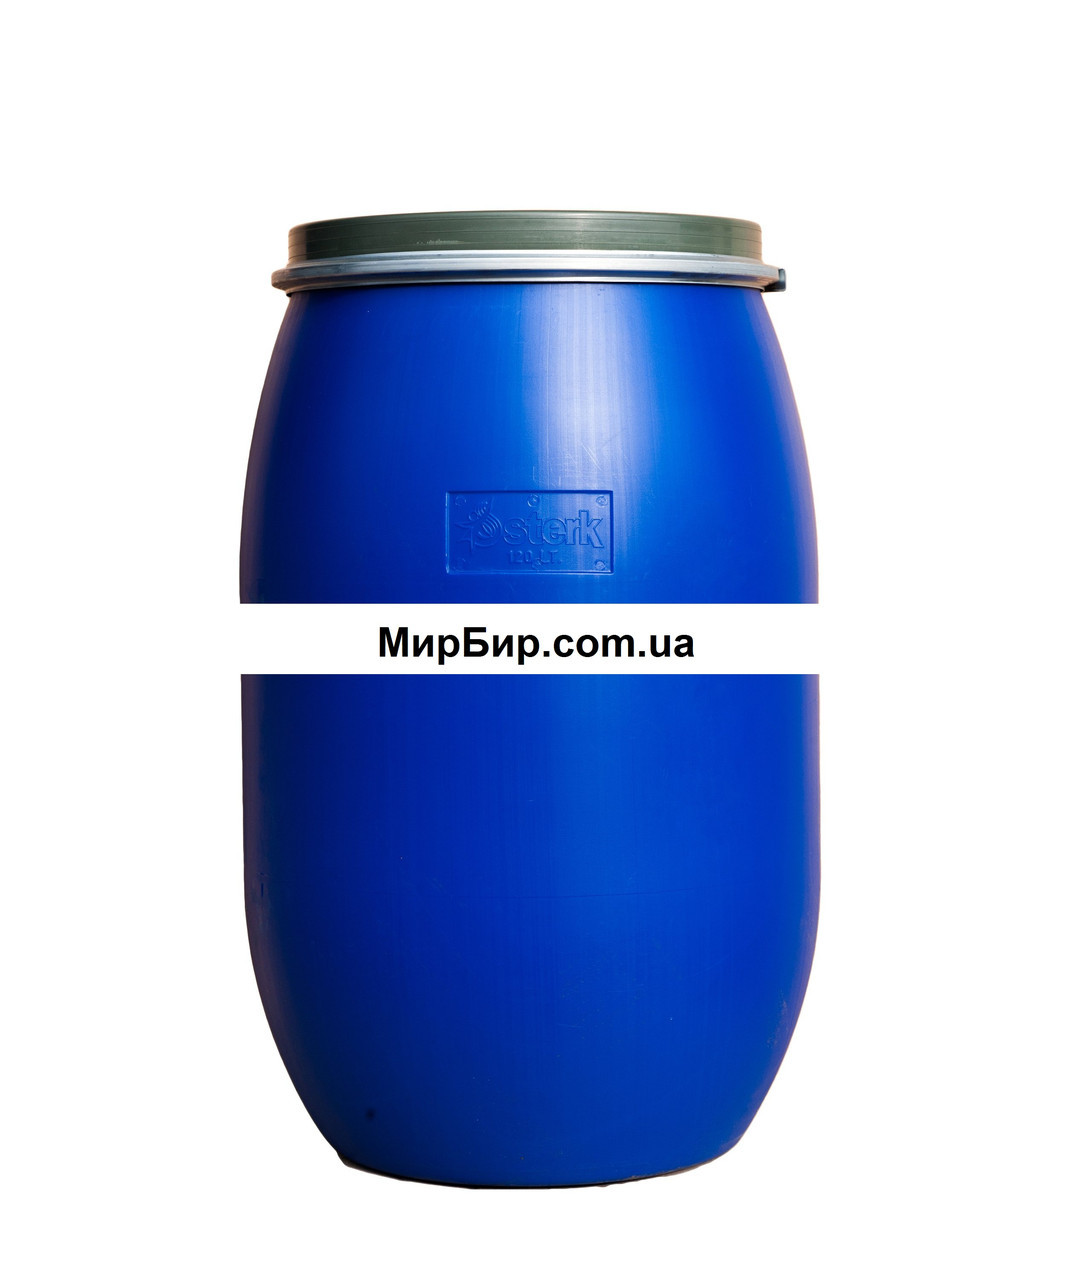 Бочка с зажимом, 120 литров